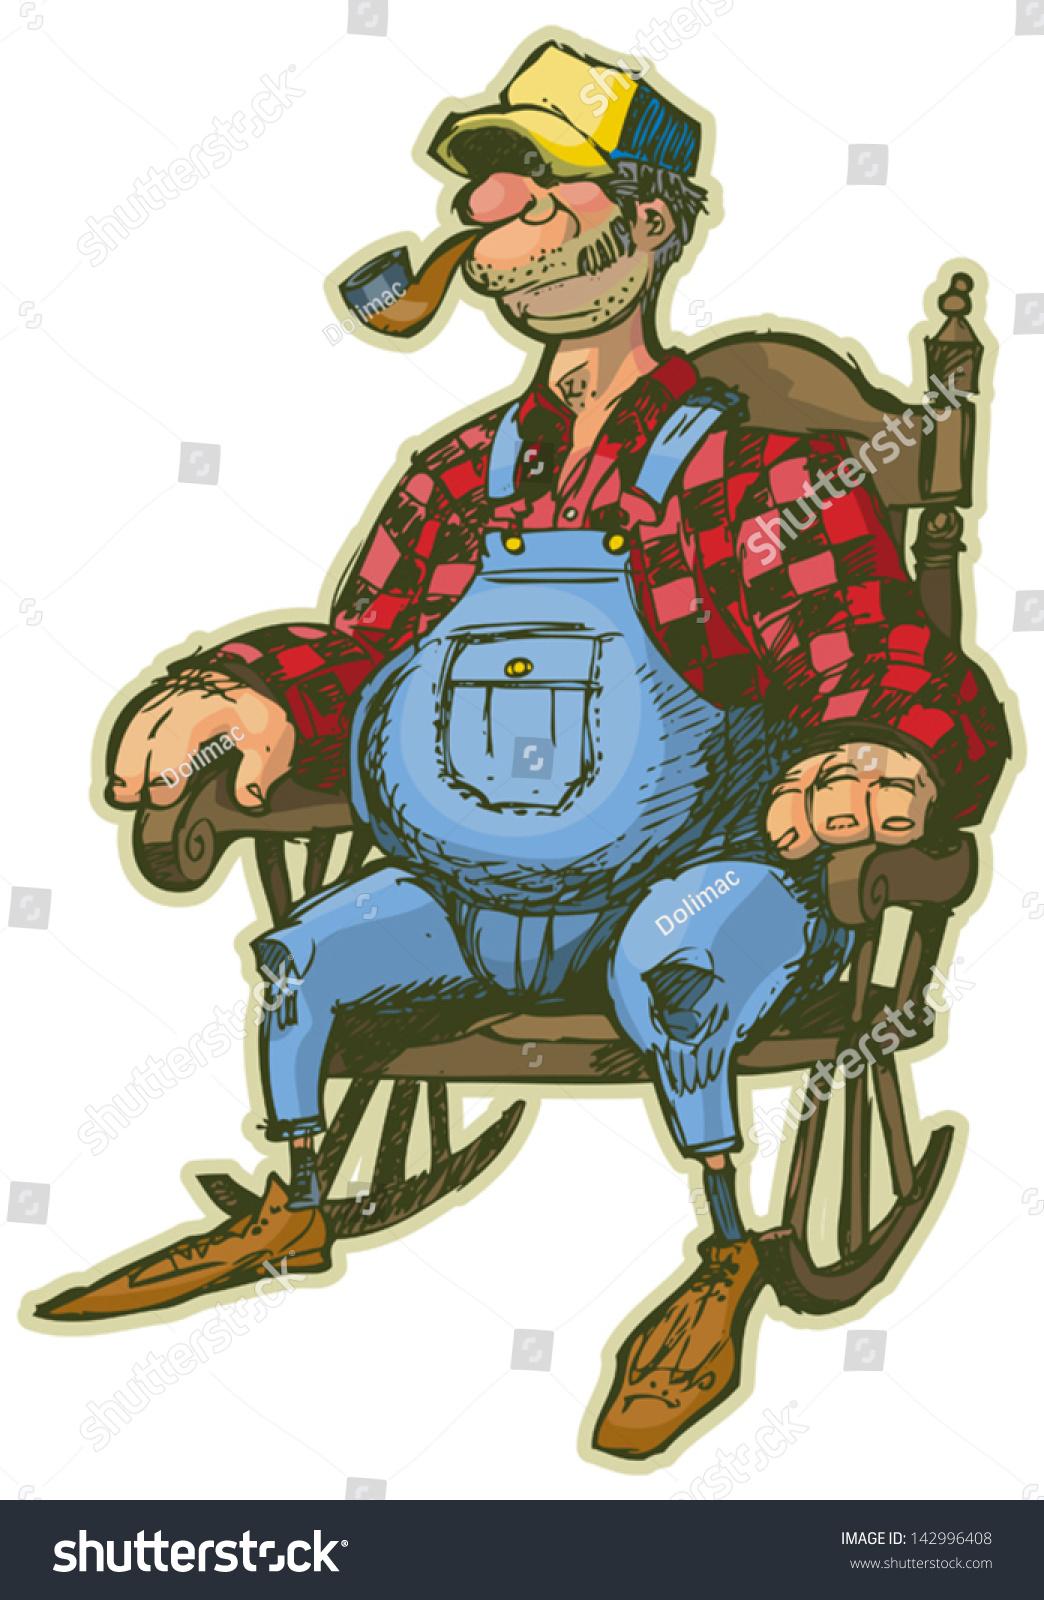 Vector Cartoon of an Elderly Man in a Rocking Chair. Looks like a ...